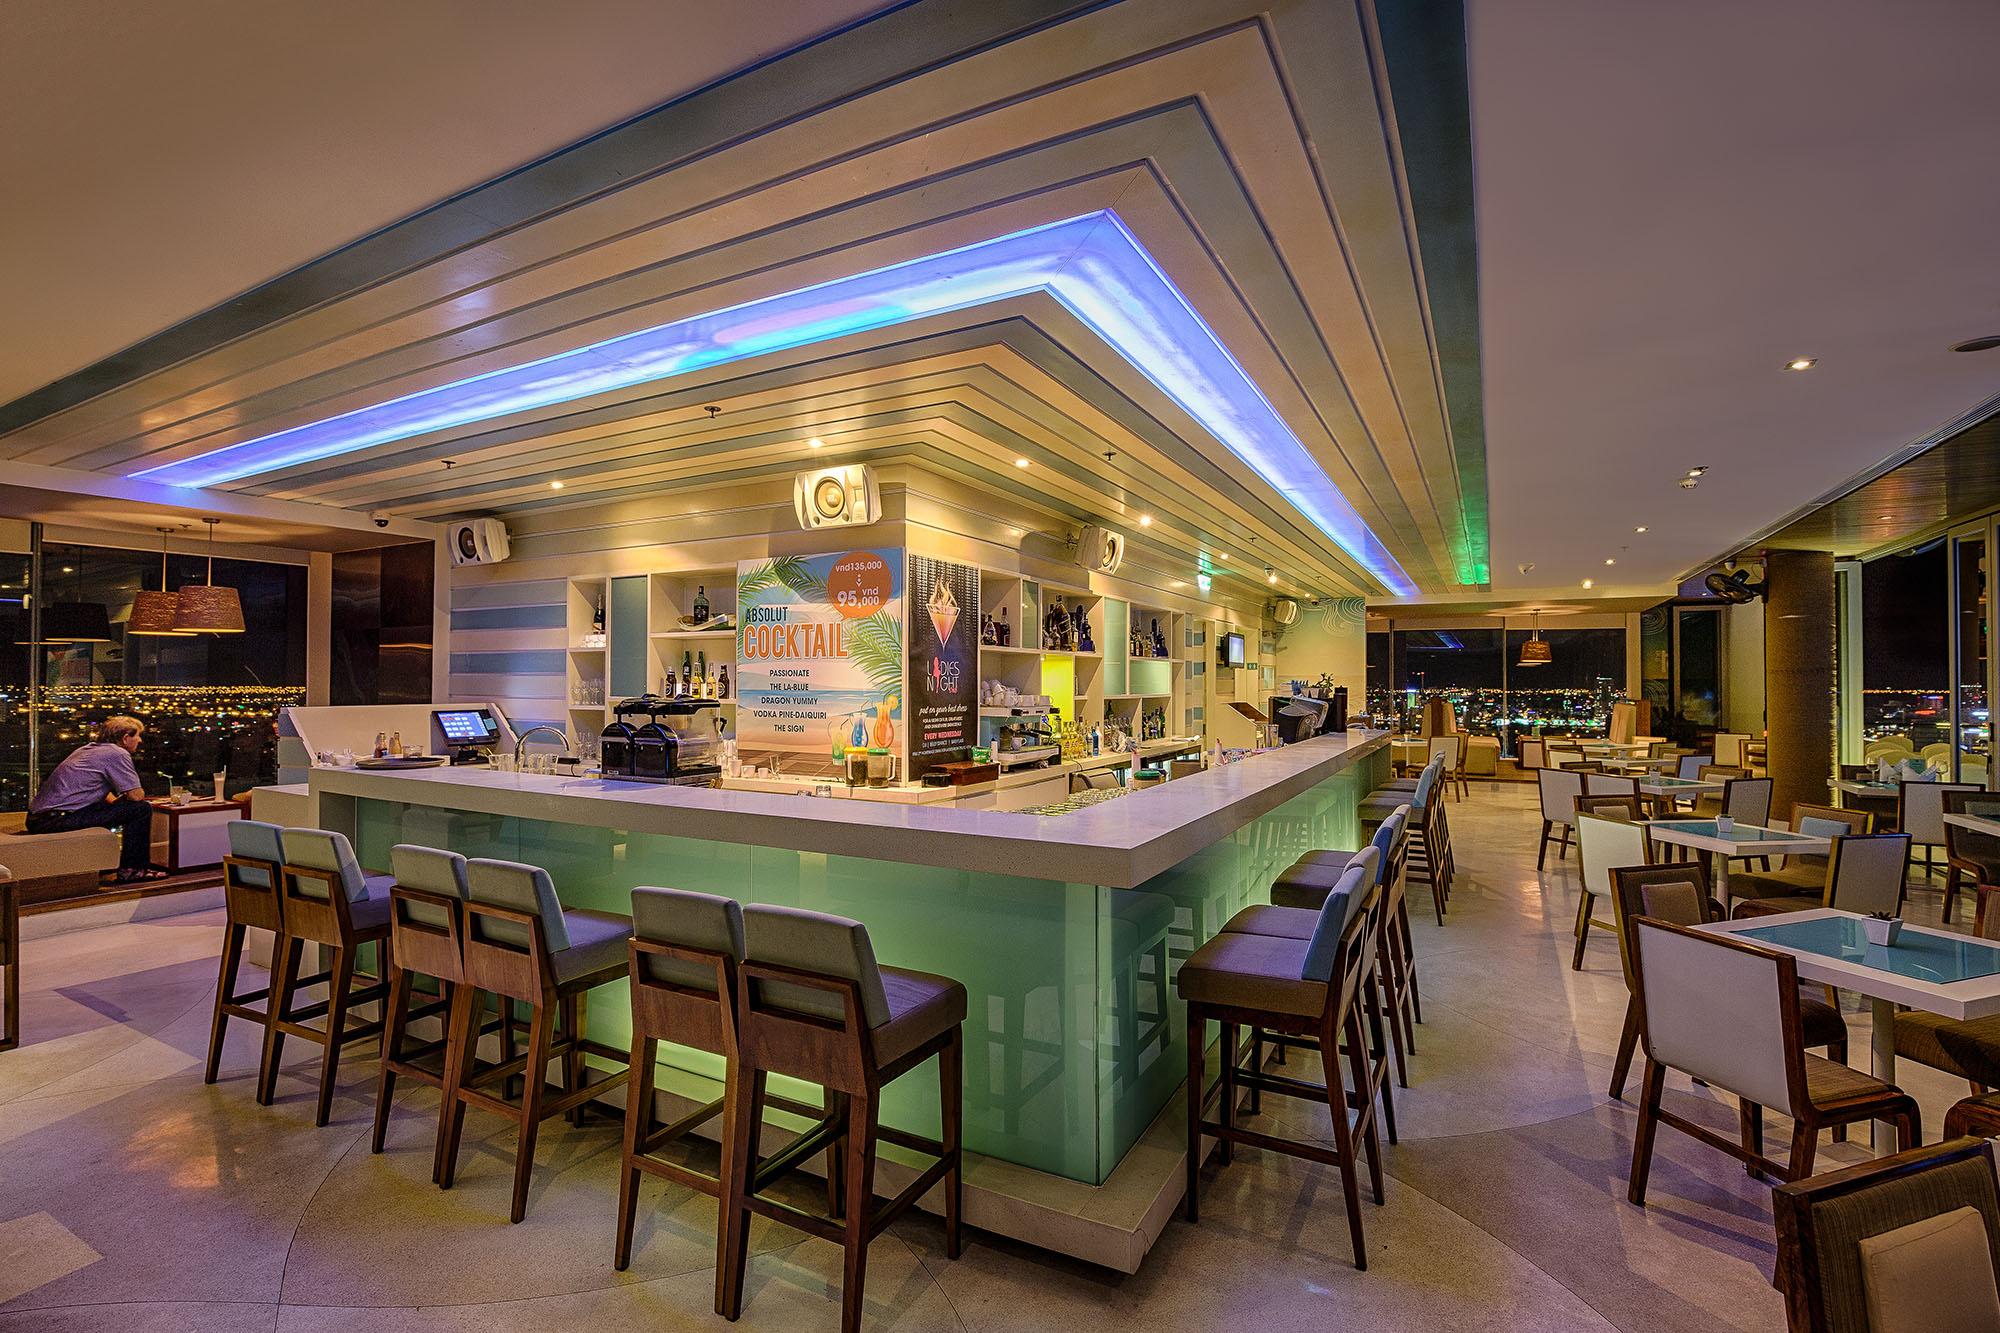 The Top Bar A La Carte Danang Beach Hotel 200 Vo Nguyen Giap Danang Fantasticity Com 05